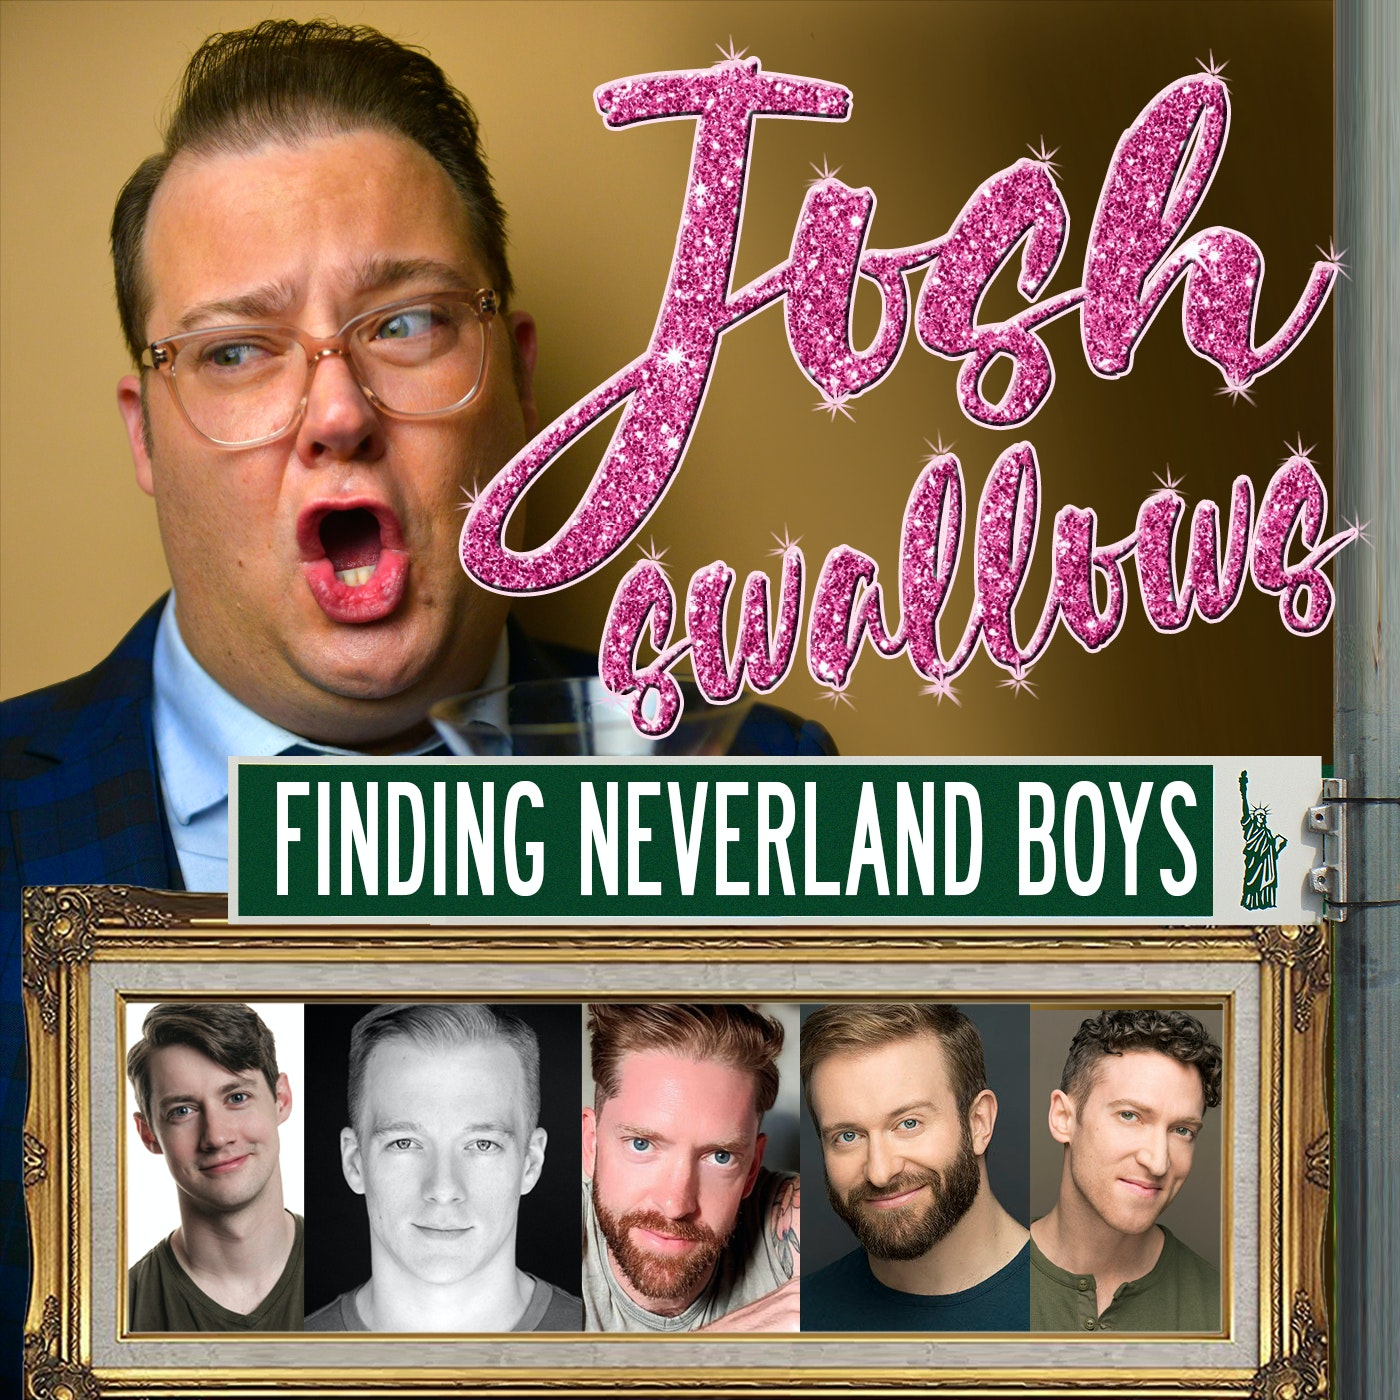 Finding [the] Neverland [boys]: Ryan Worsing, Jonathan Ritter, Colin Cunliffe, Ron Todorowski & Chris Dwan